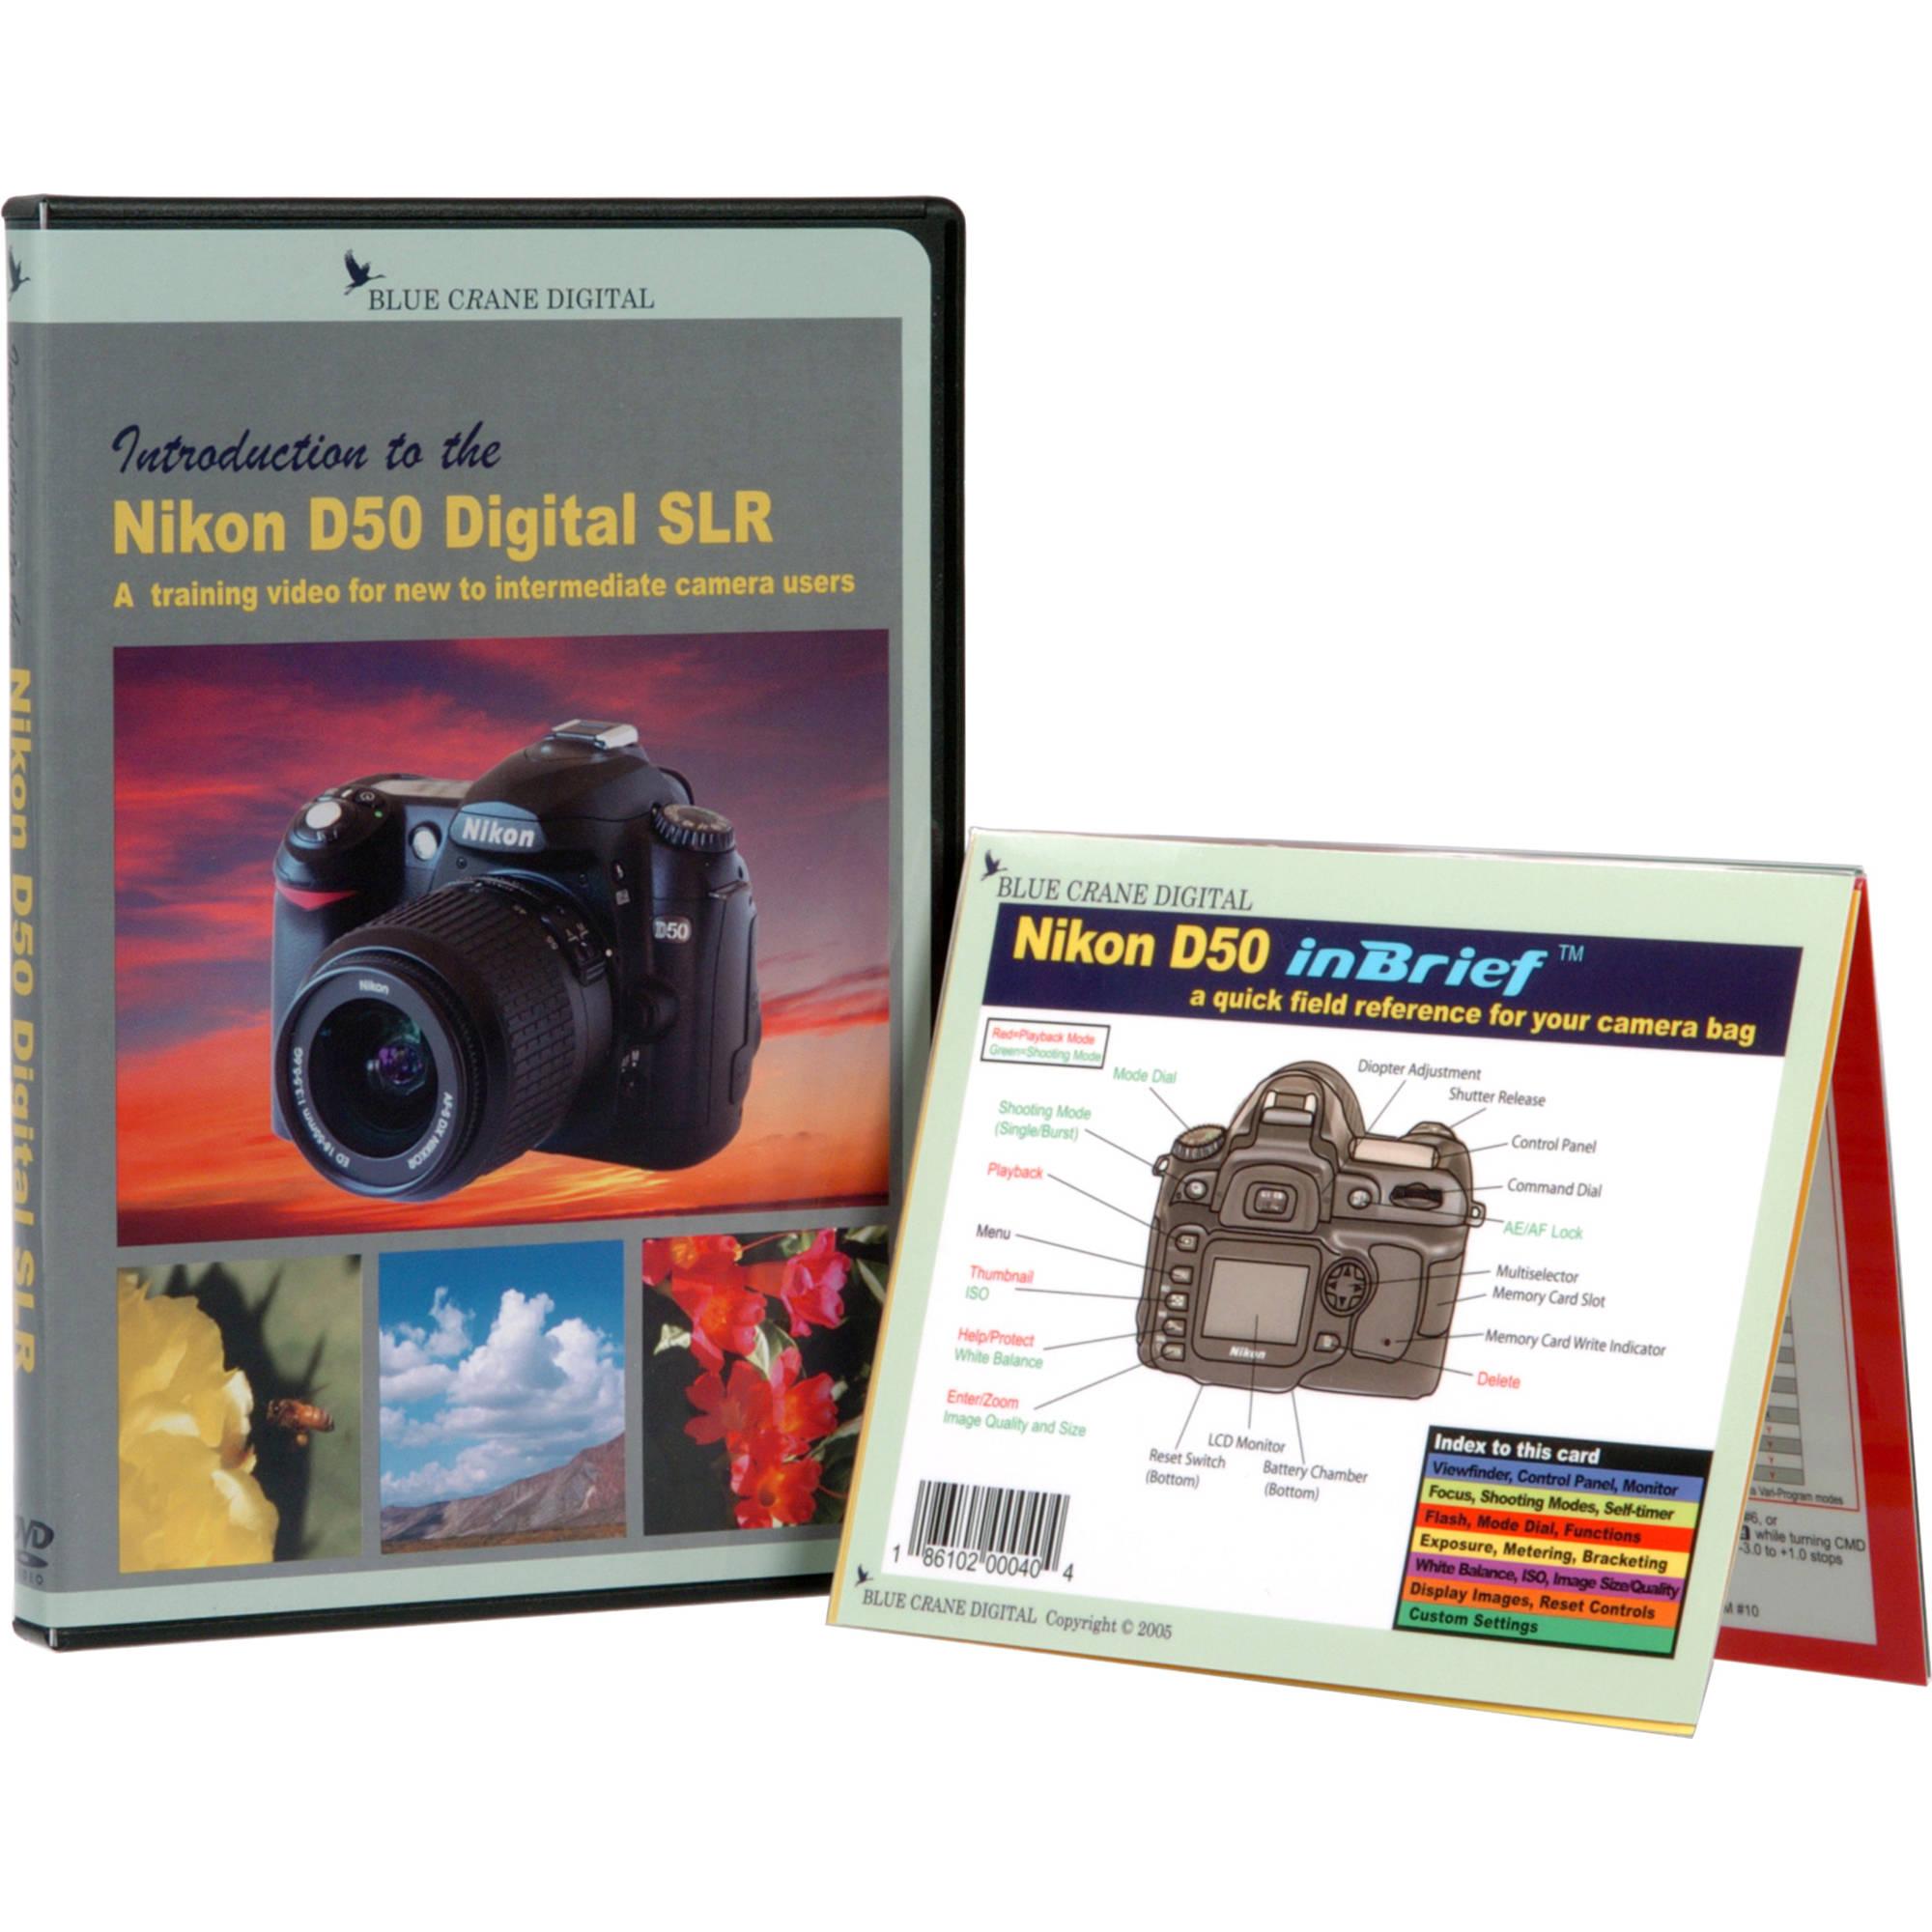 Blue Crane Digital DVD and Guide: Combo Pack for the Nikon D50 Digital SLR  Camera